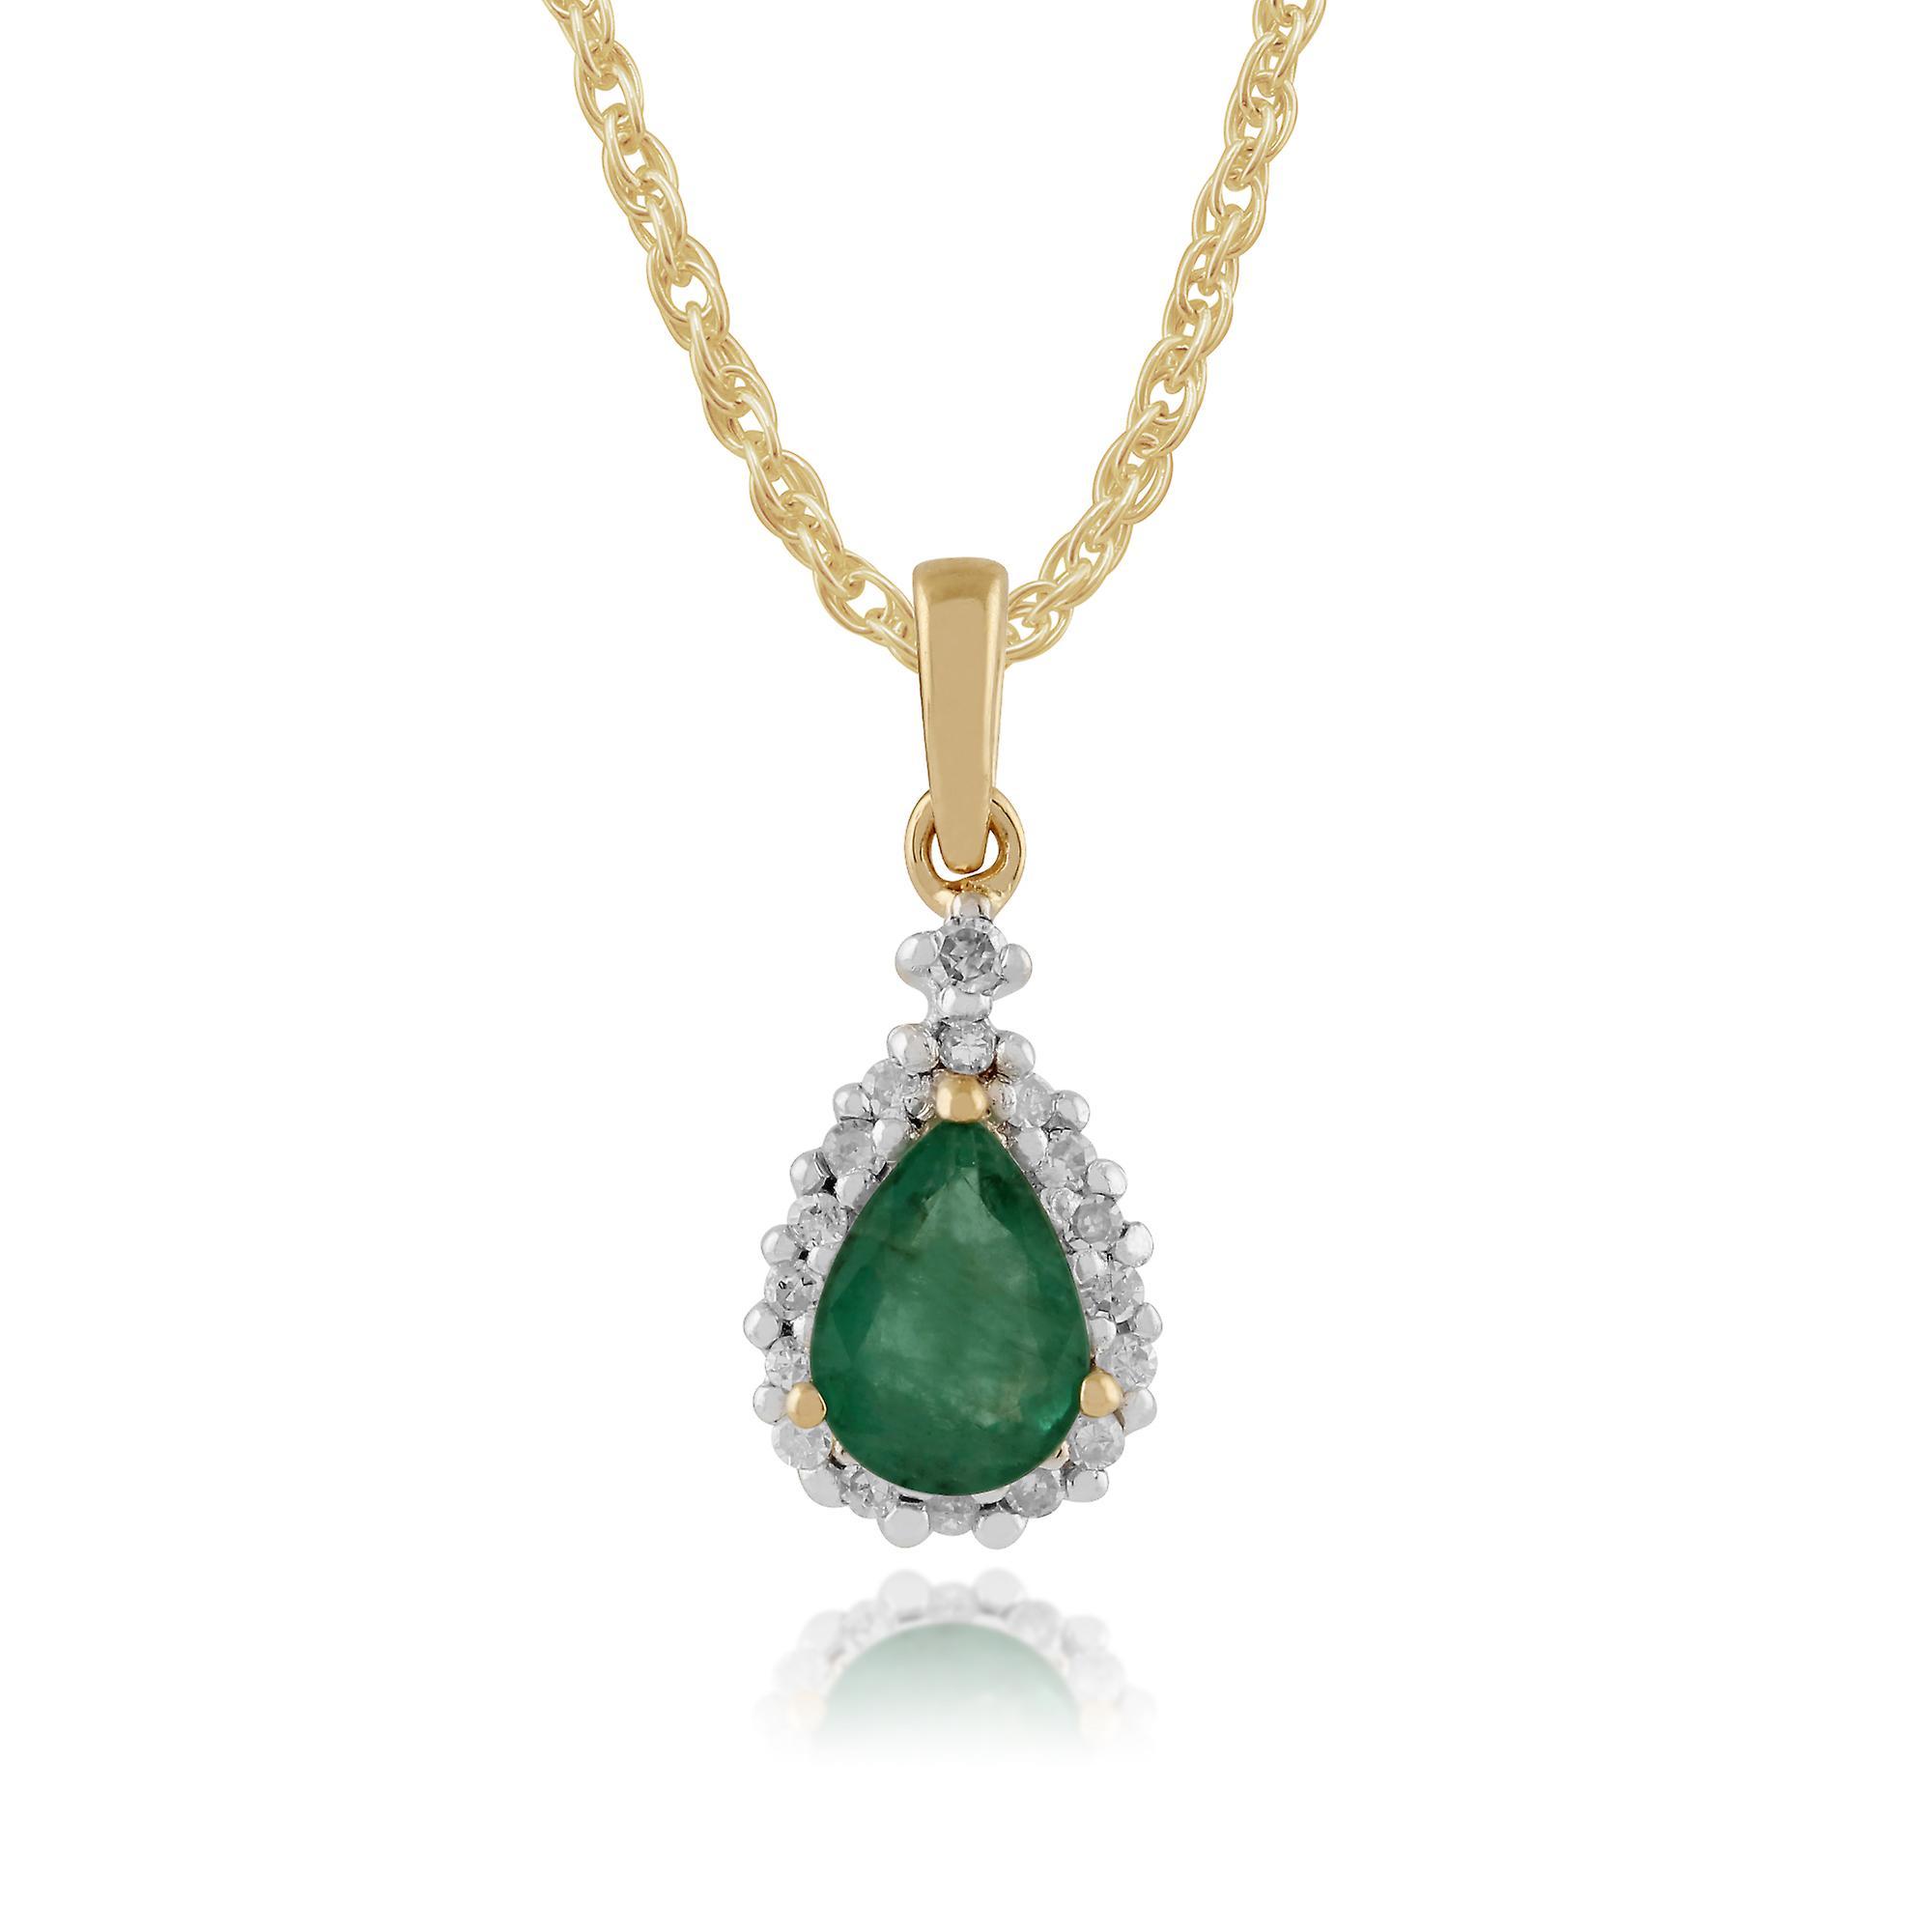 Gemondo 9ct Yellow Gold 0.66ct Emerald & Diamond Pear Cluster Pendant on Chain